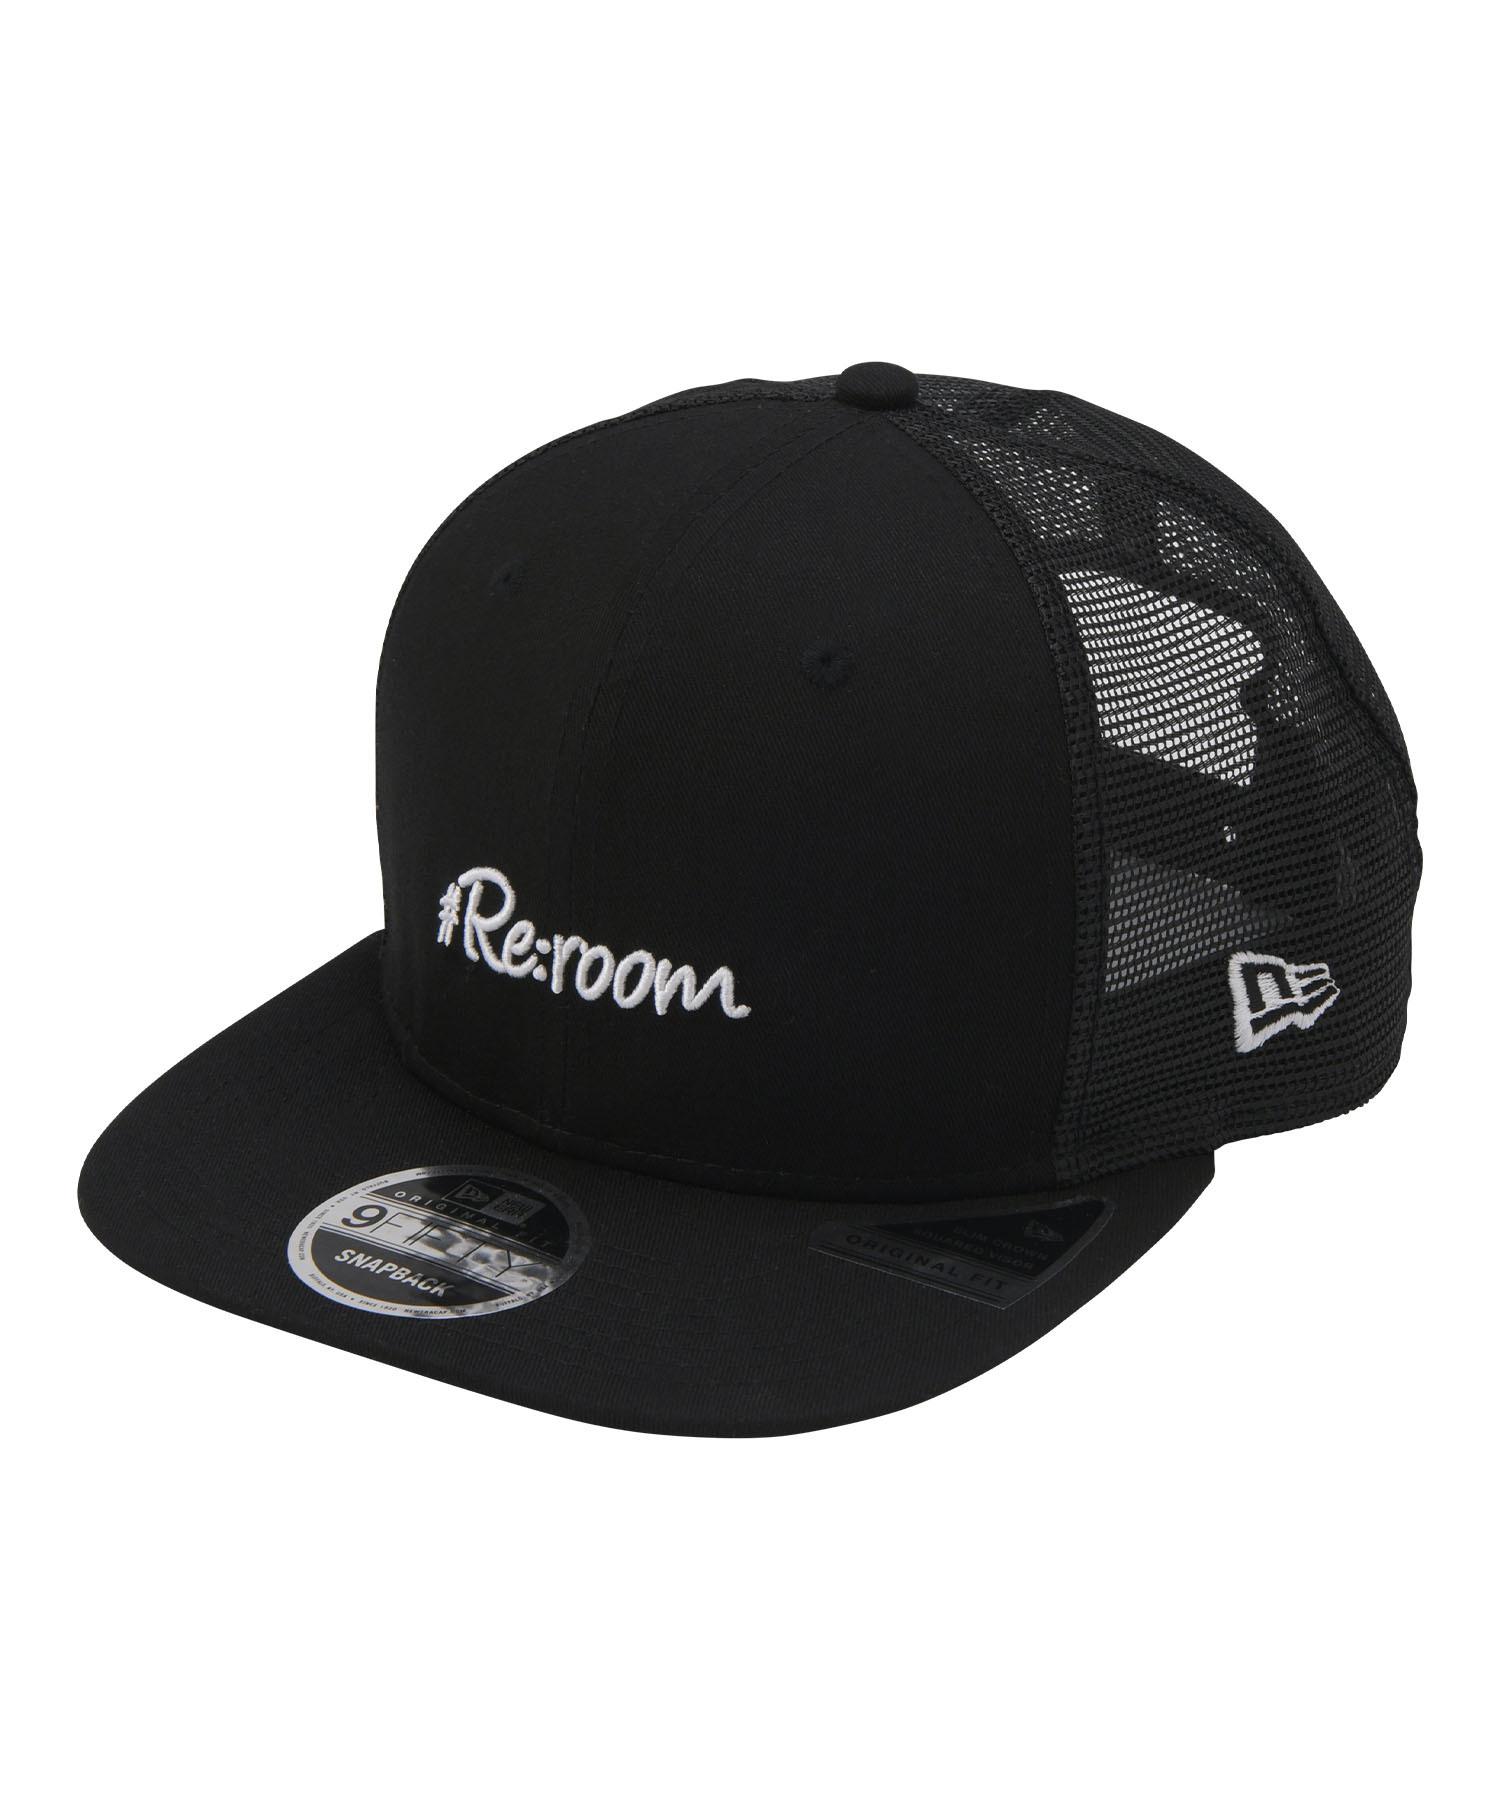 #Re:room×NEW ERA 9FIFTY ORIGINAL FIT Trucker Mesh[REH118]